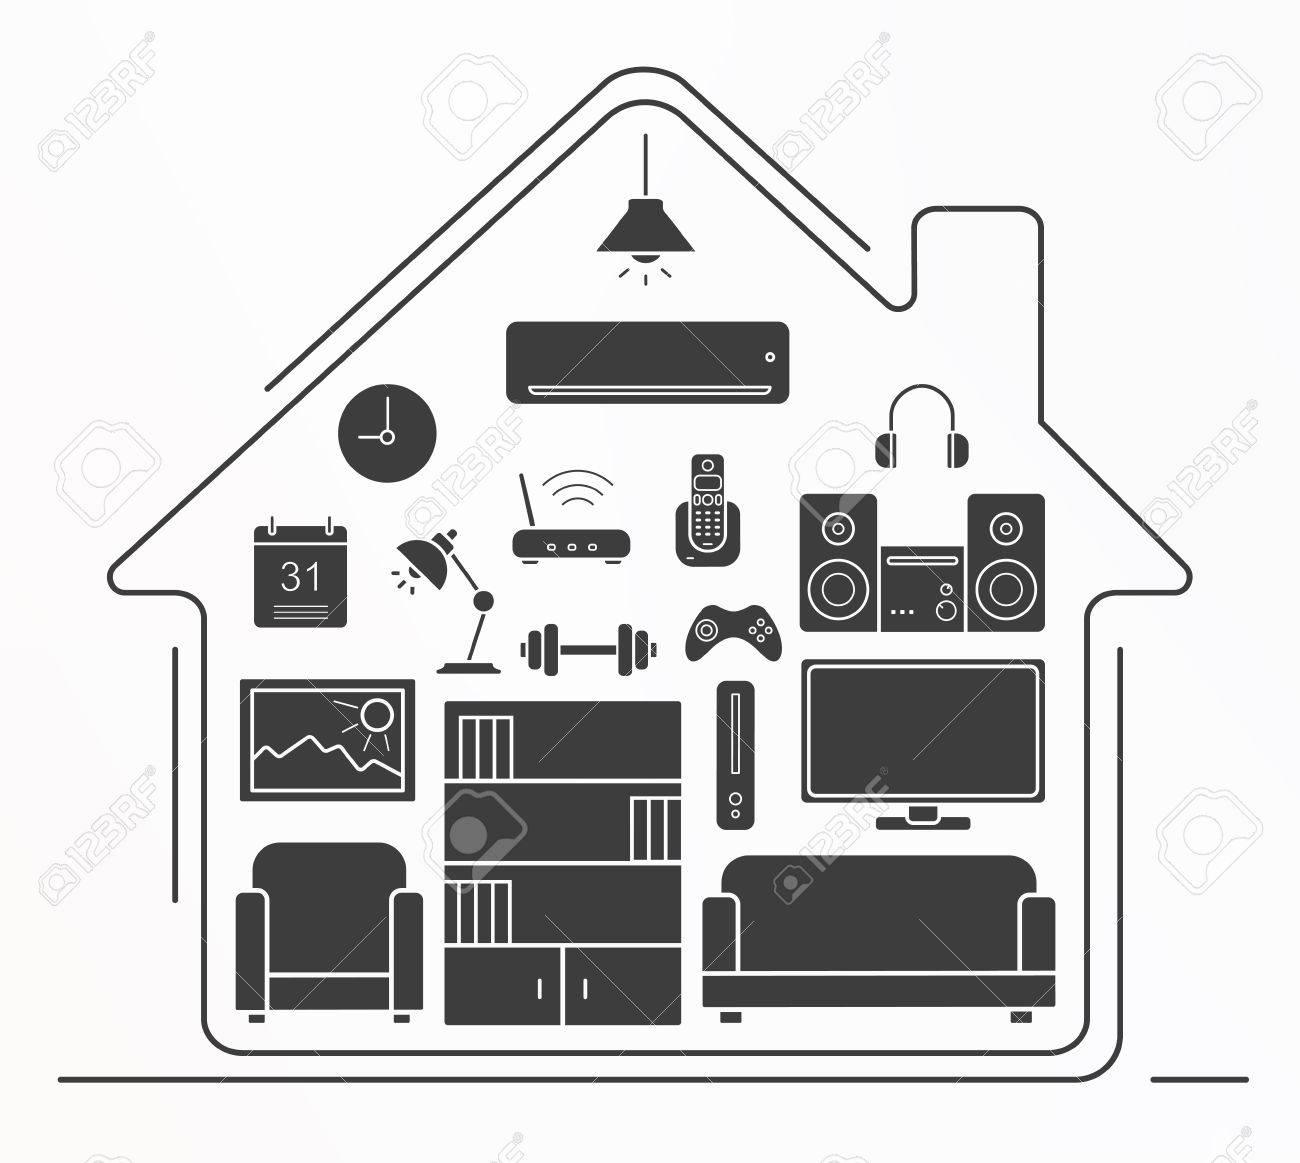 Living Room Interior Design Silhouette Icons Set House Furniture